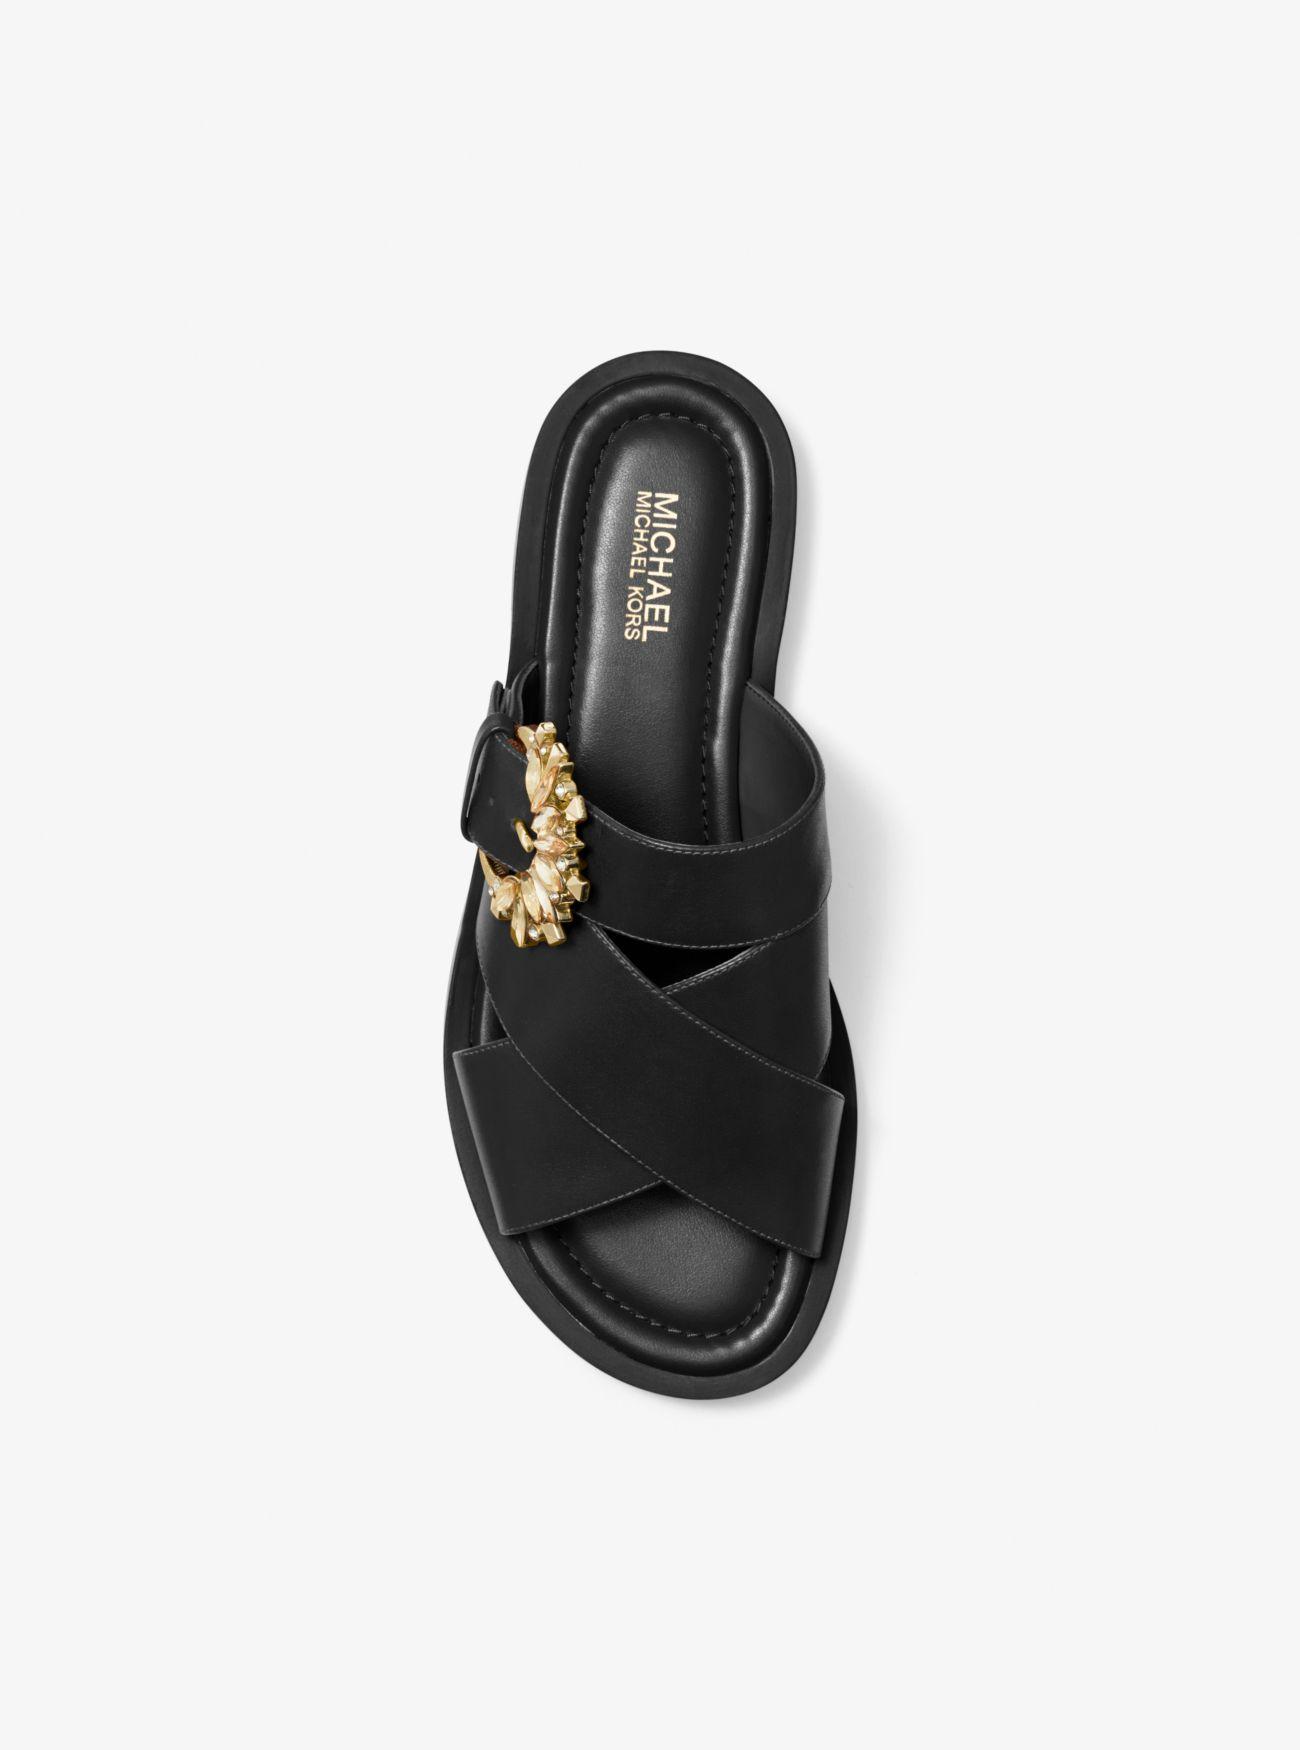 0a1118b6fd10 Frieda Leather Sandal Frieda Leather Sandal Frieda Leather Sandal. MICHAEL  Michael Kors